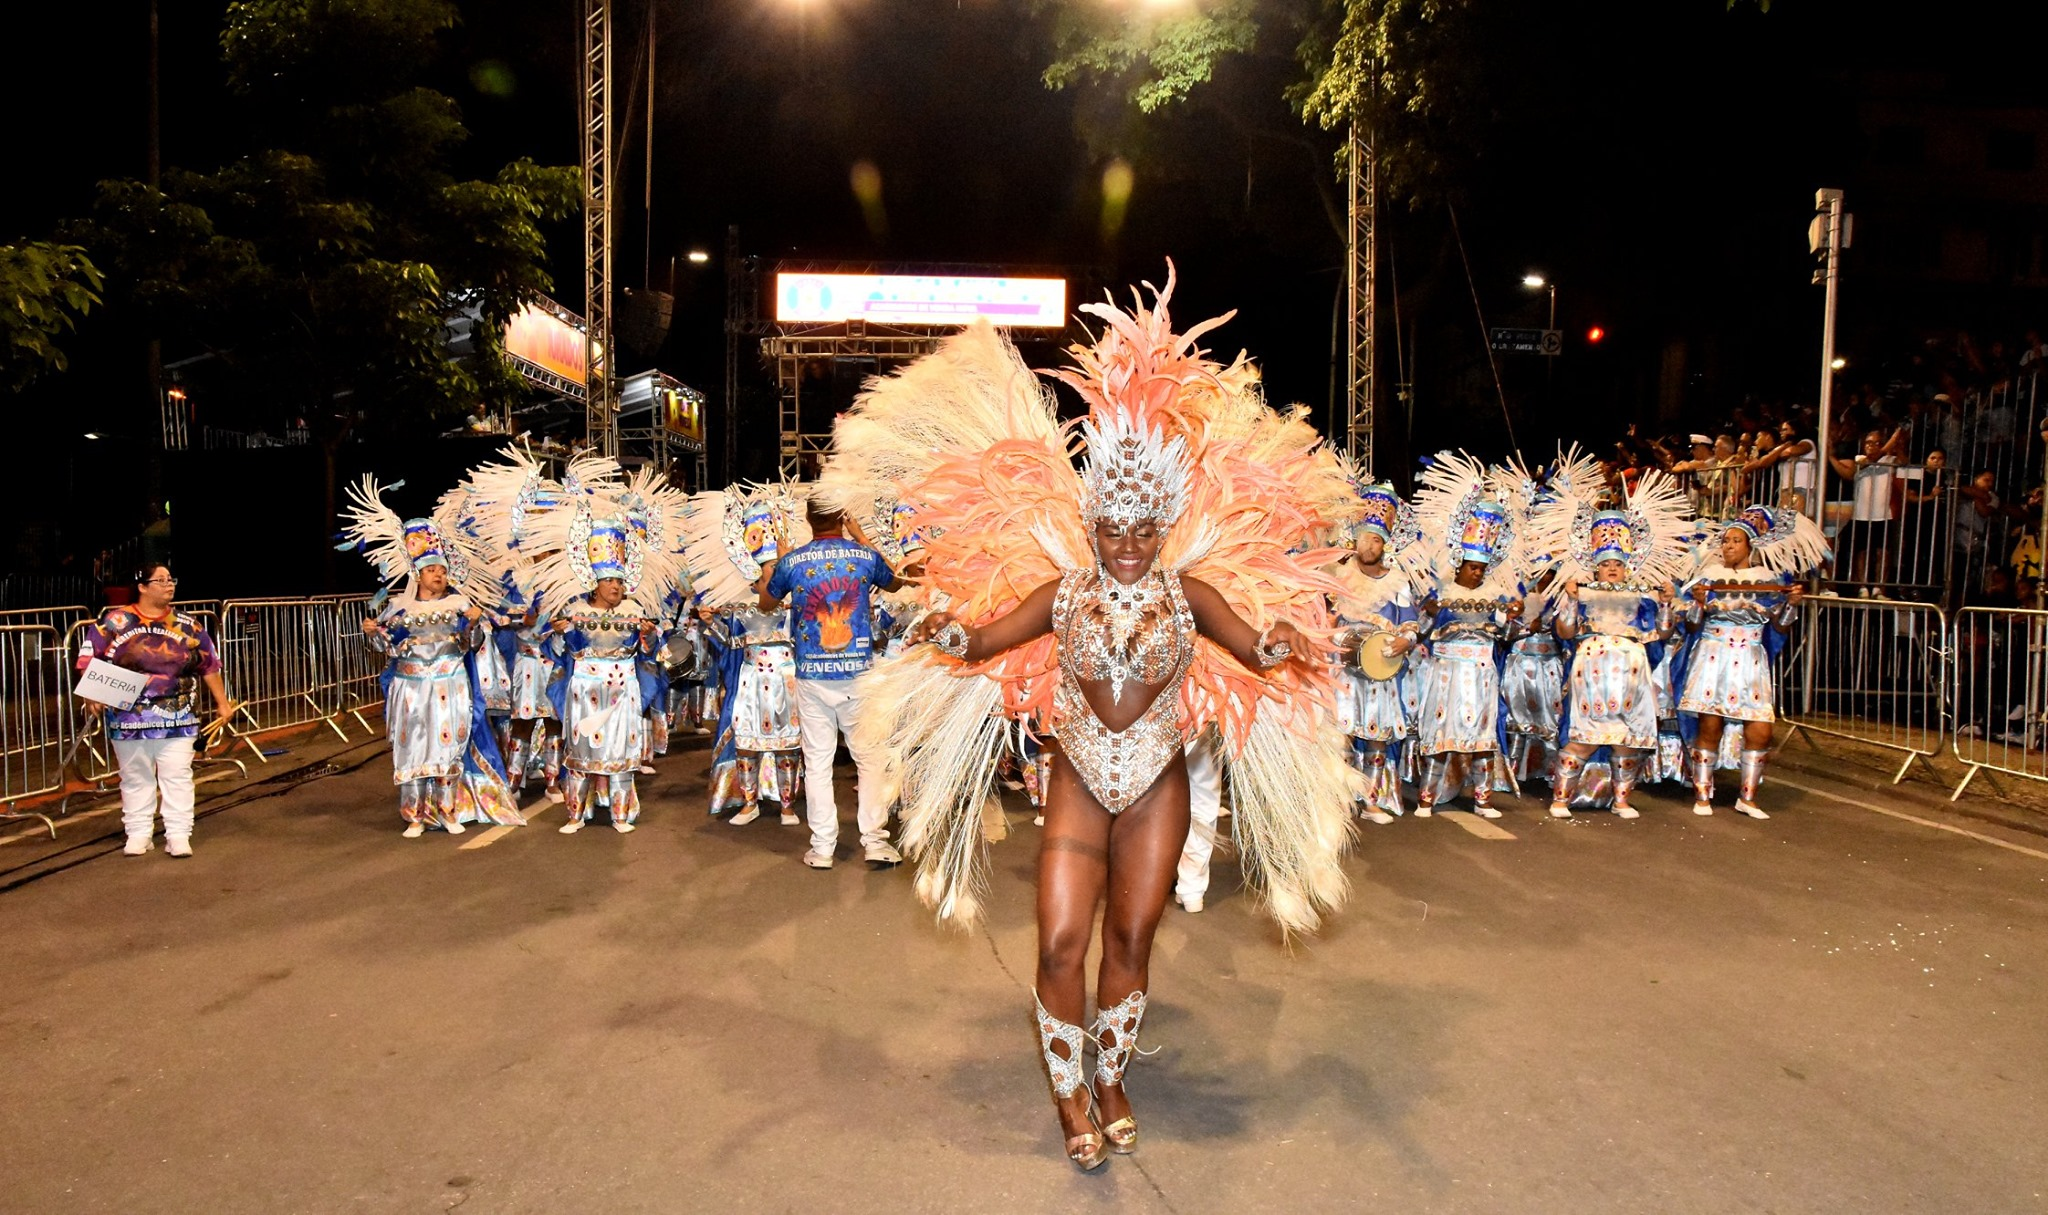 """ÁFRICA MÃE ANCESTRAL DOS IMPÉRIOS GLORIOSOS"", Enredo da Escola de Samba Acadêmicos de Venda Nova 2022"